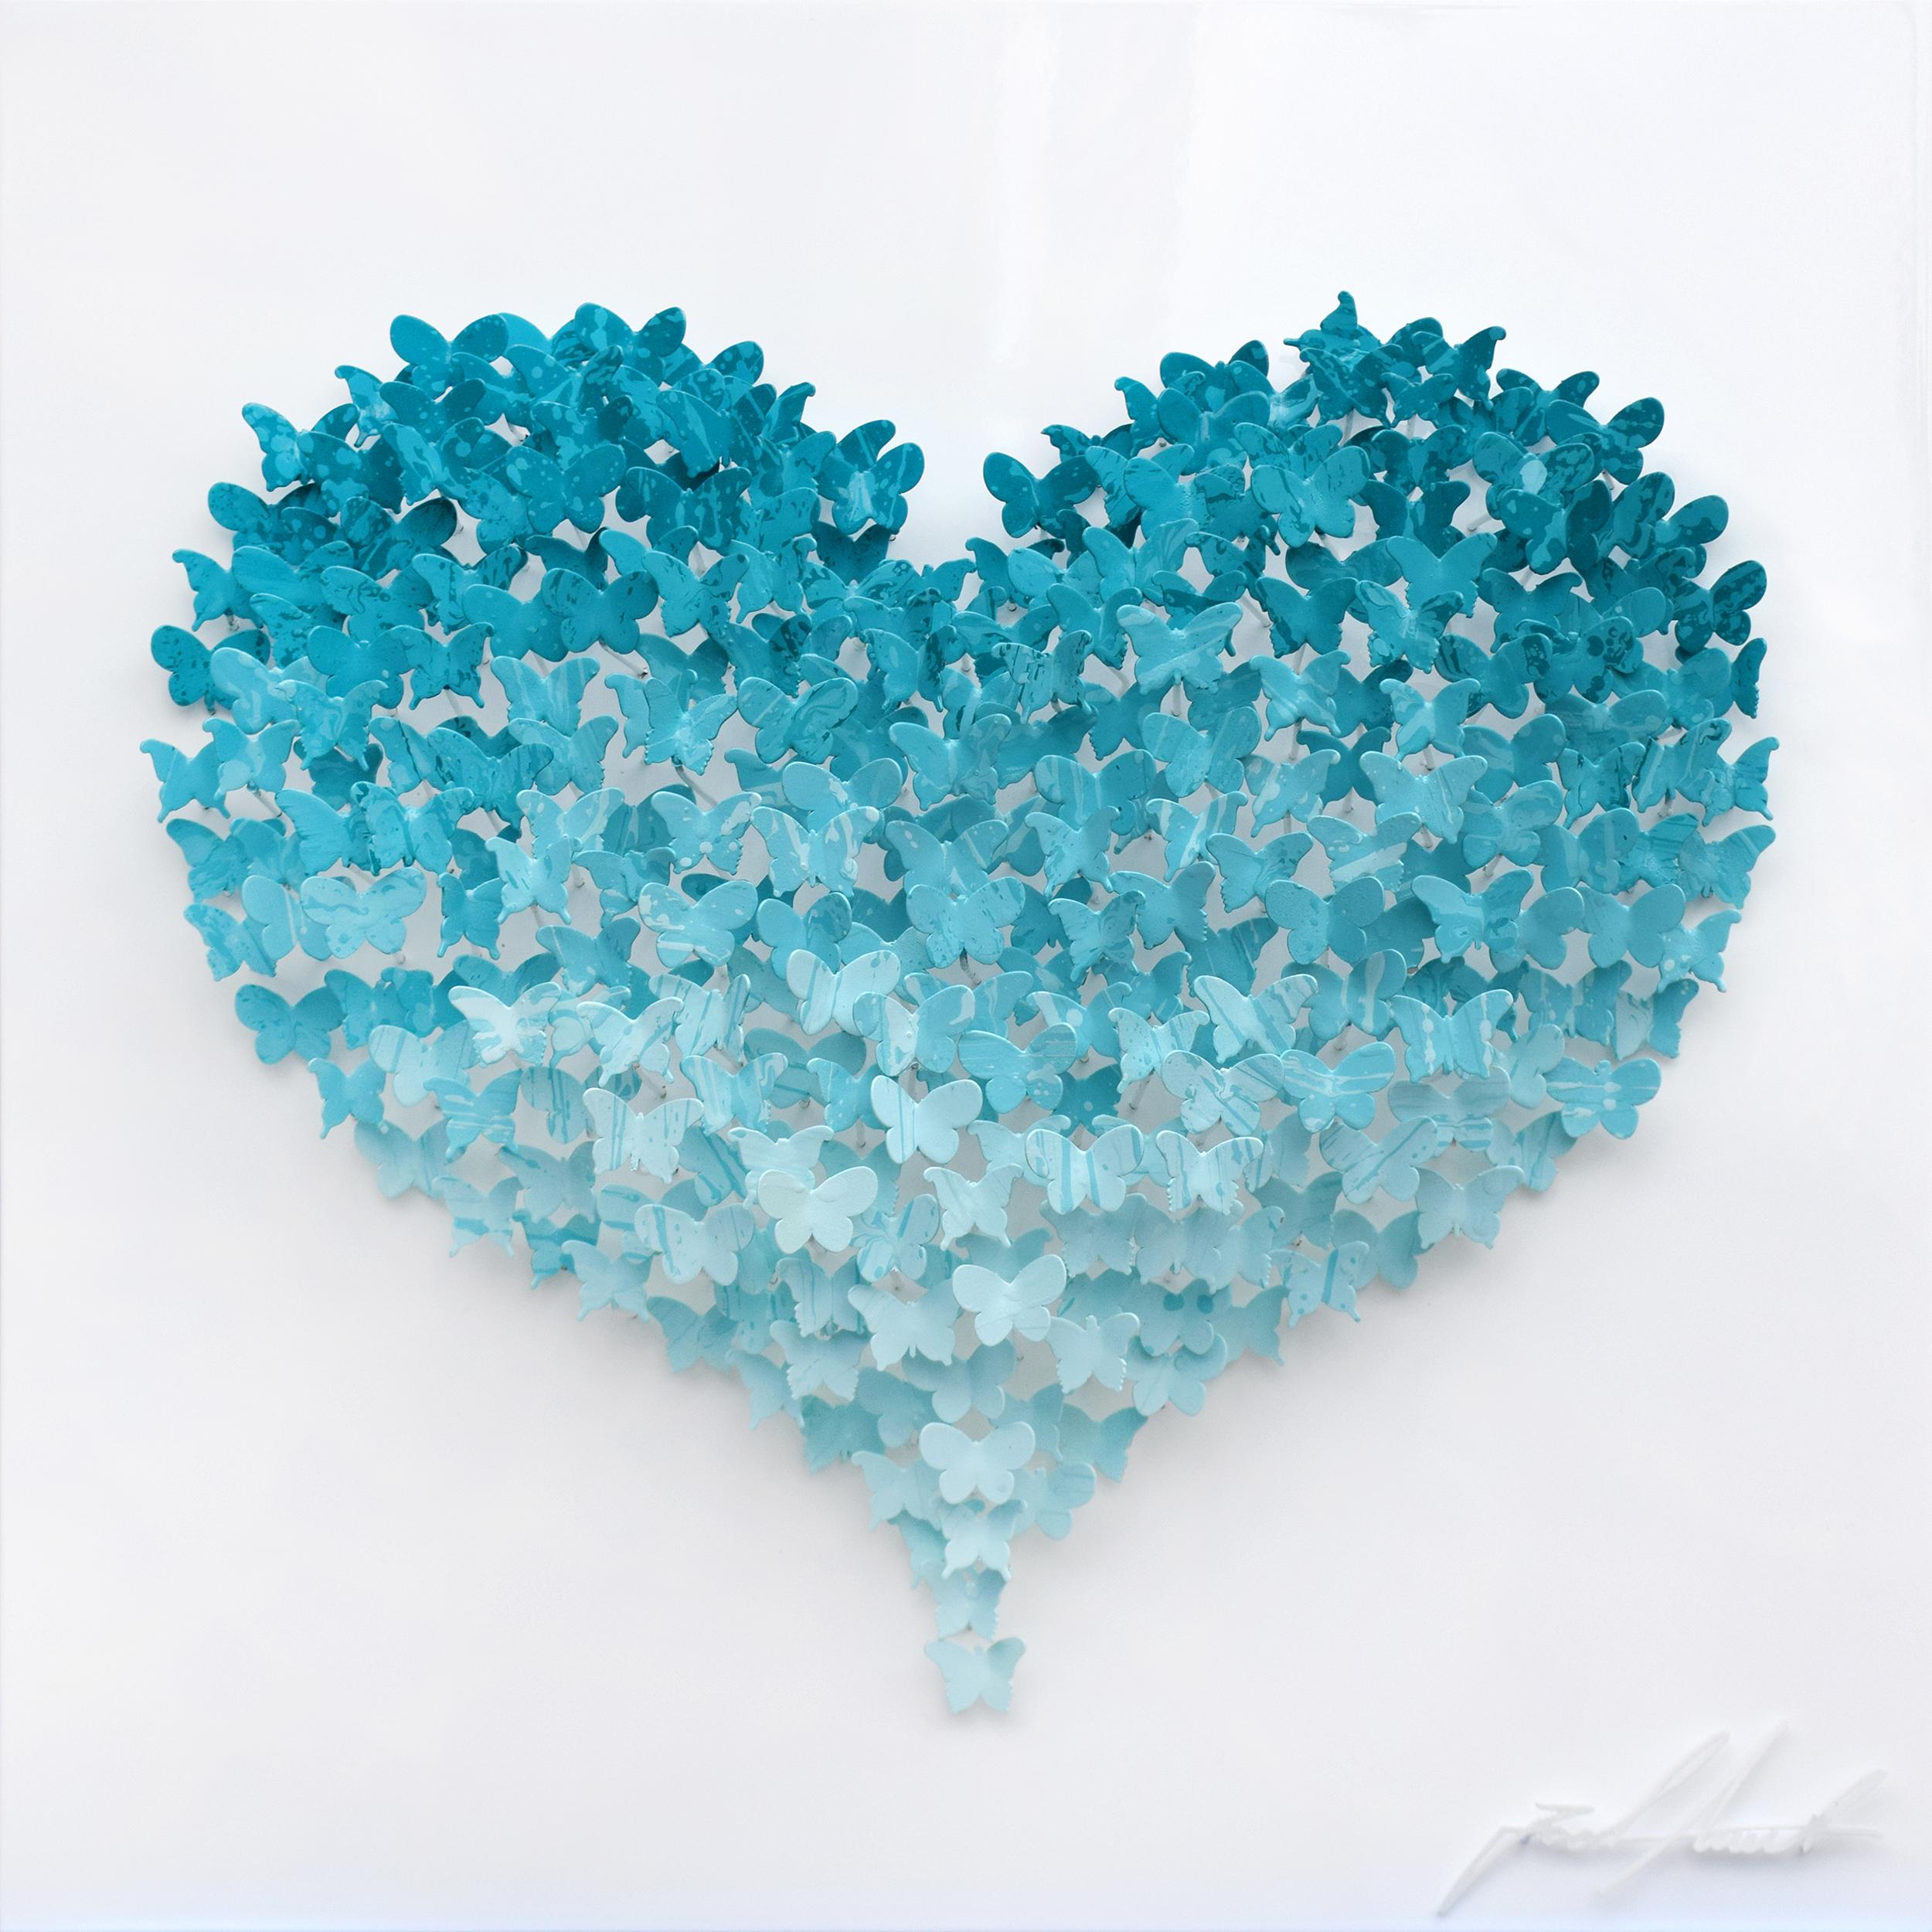 Joel Amit - Flying Love (Turquoise on White) , 6665-012-144